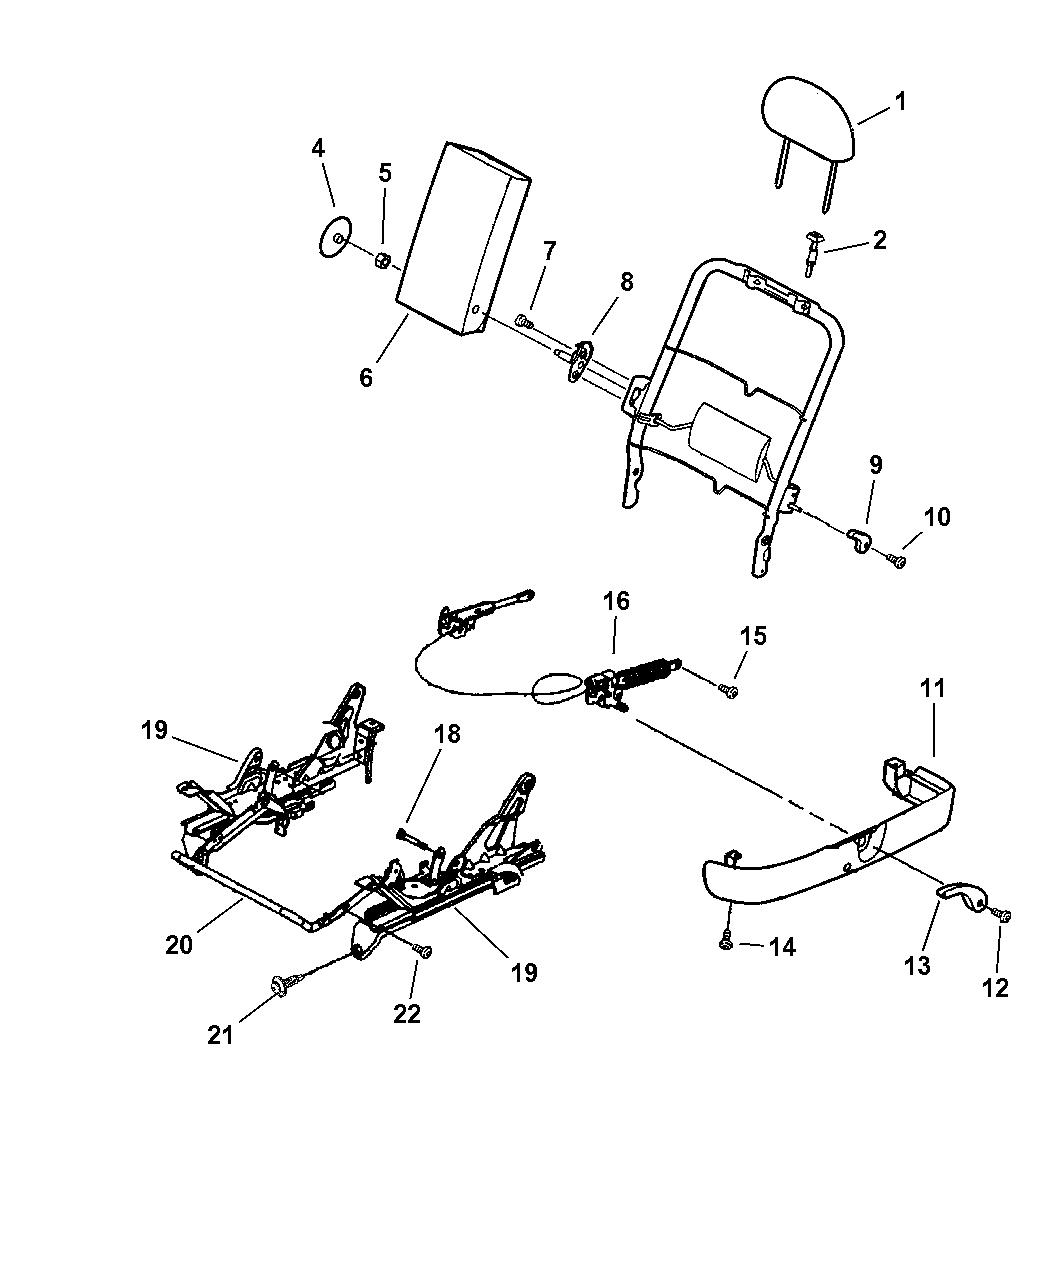 2002 Chrysler 300m Parts Diagram • Wiring Diagram For Free